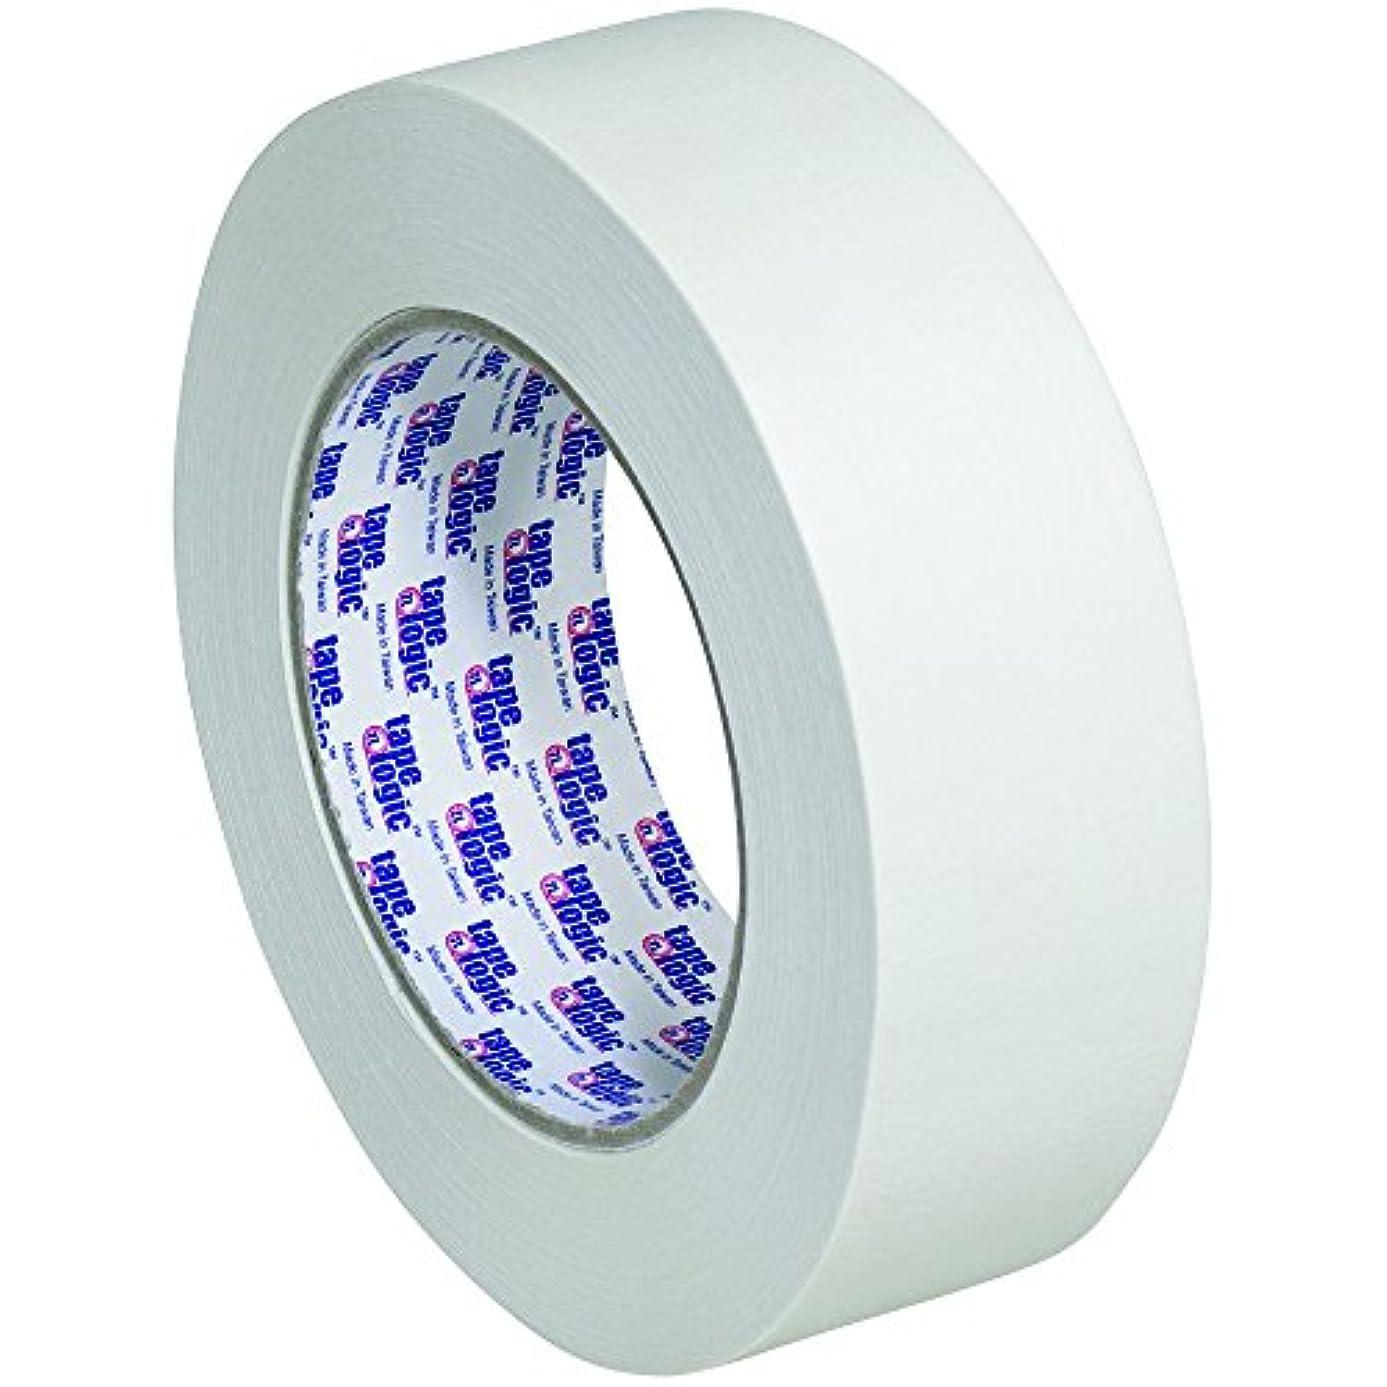 Partners Brand PT9362400 Tape Logic 2400 Masking Tape, 1 1/2